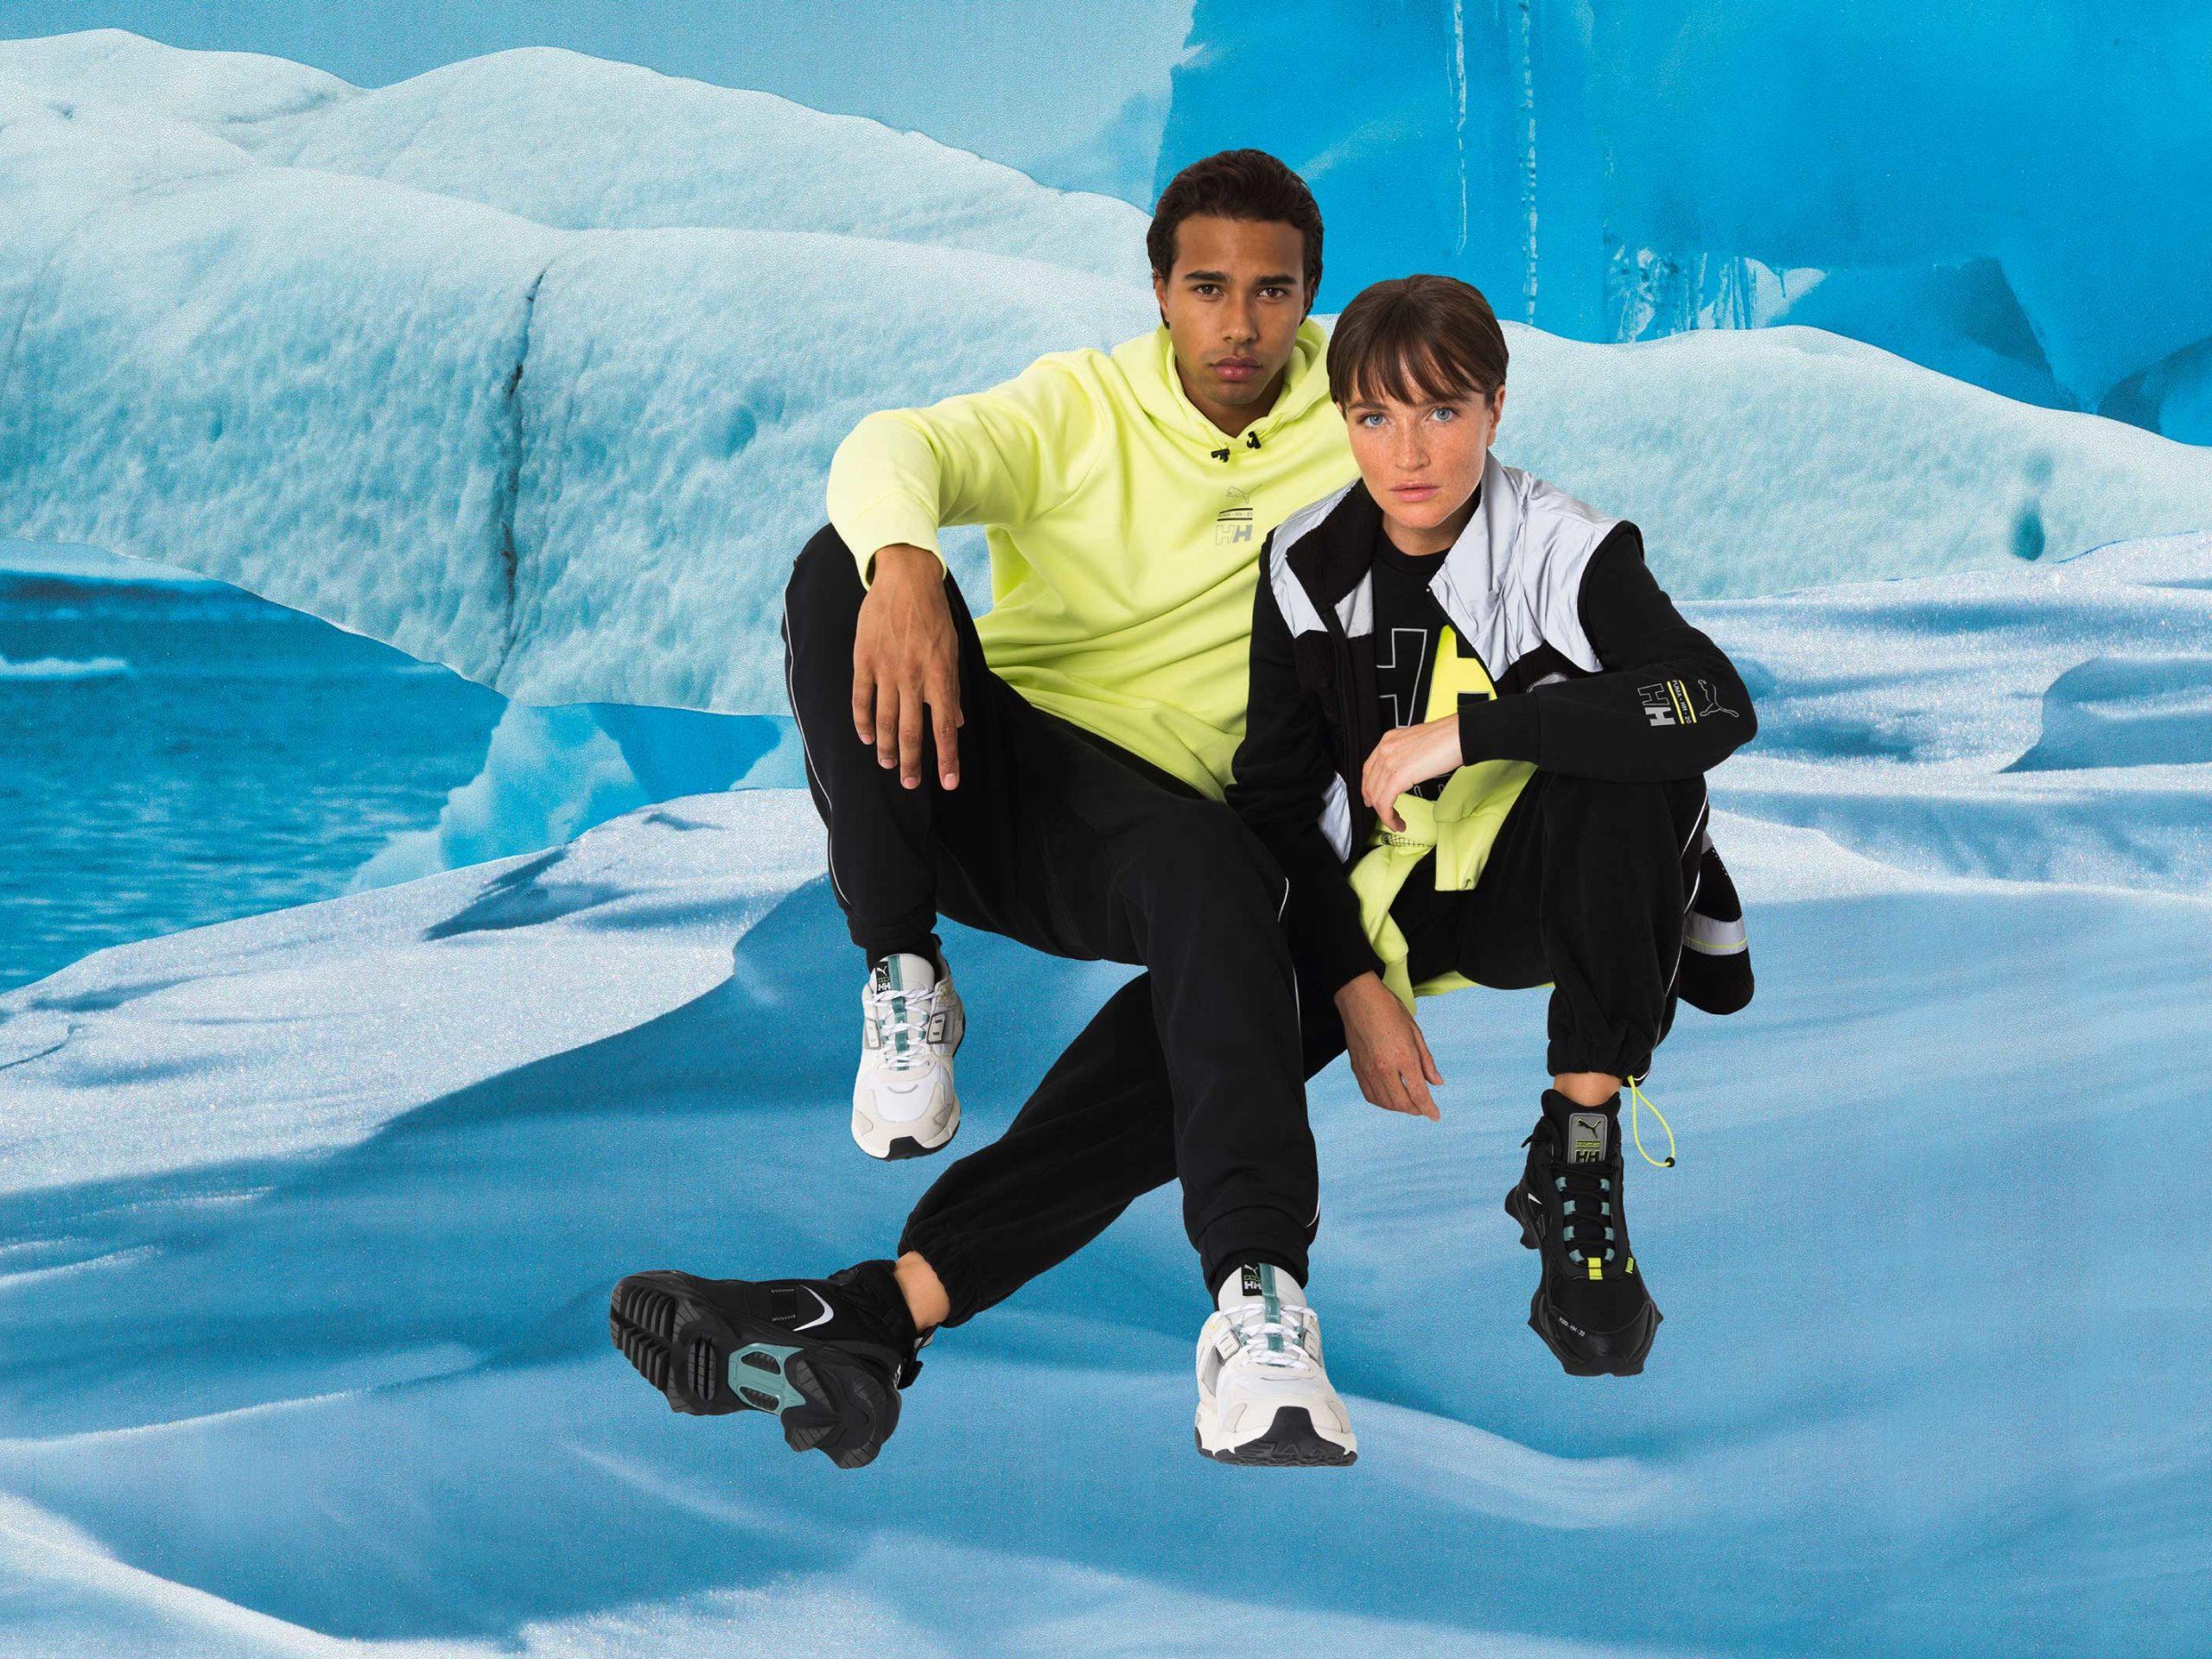 Puma x Helly Hansen Deliver Arctic Inspired Apparel